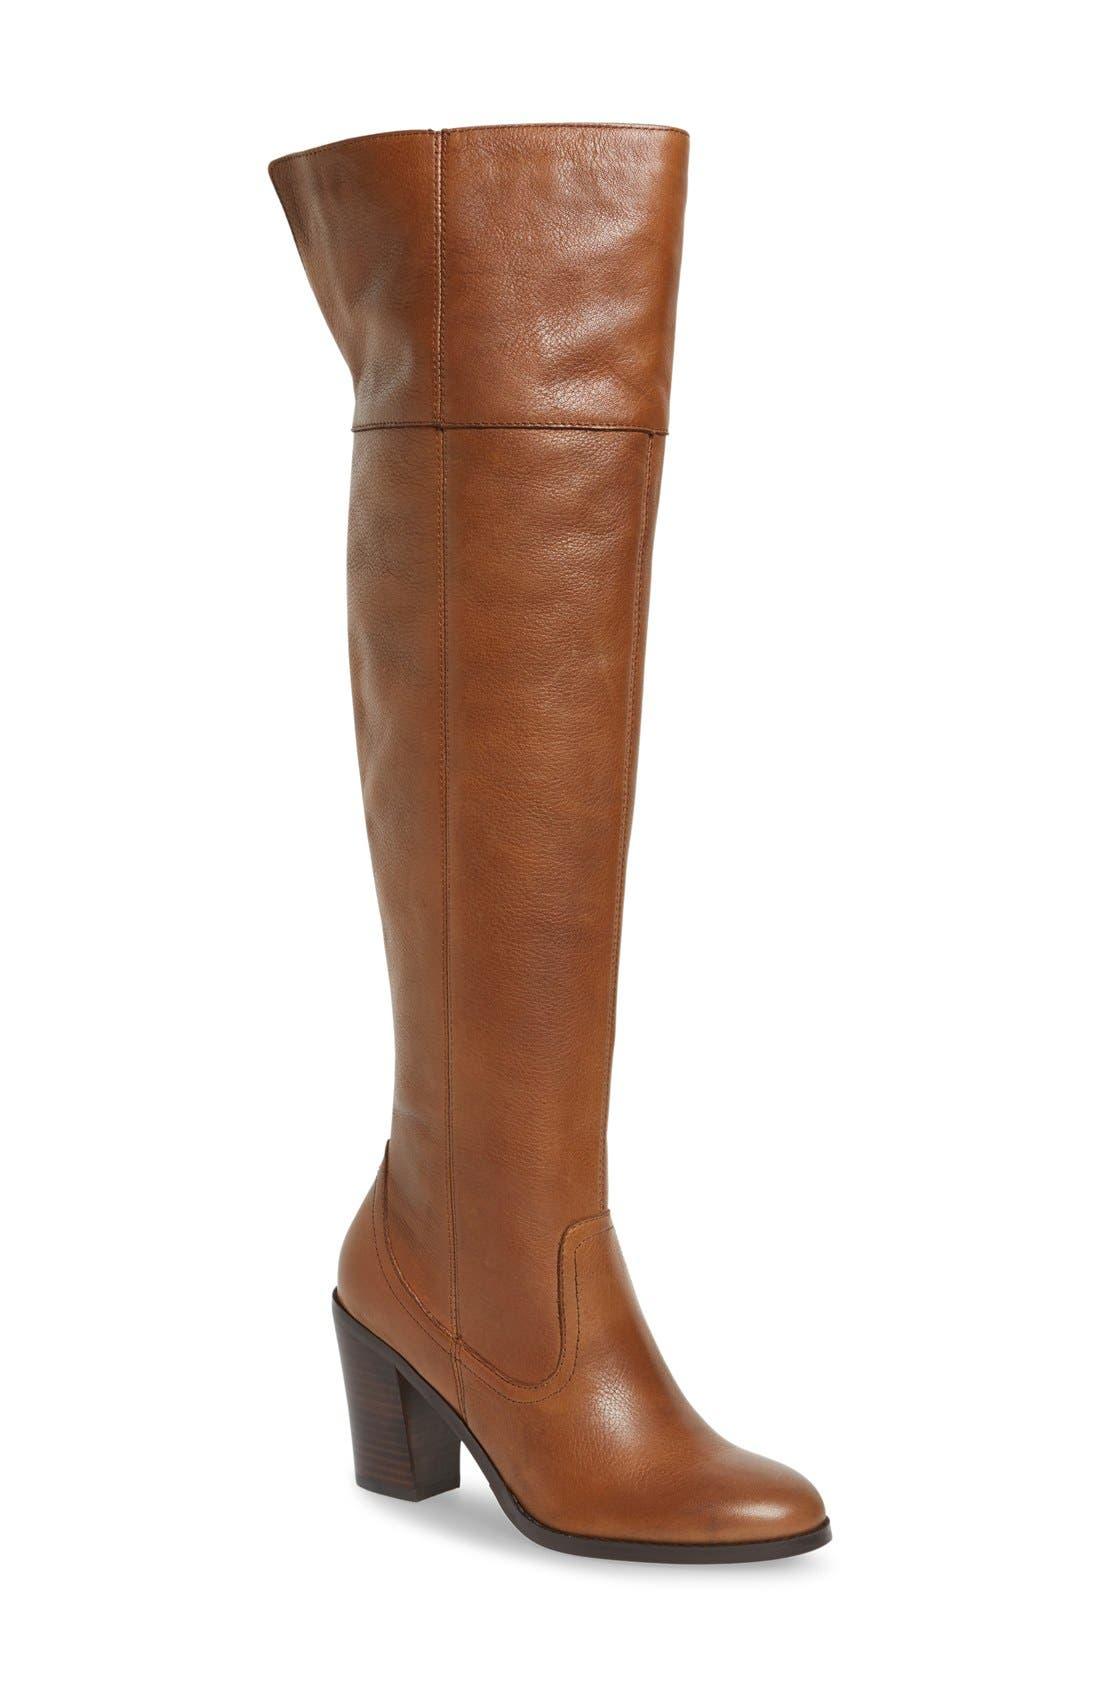 Main Image - Corso Como Harrison Over the Knee Boot (Women)